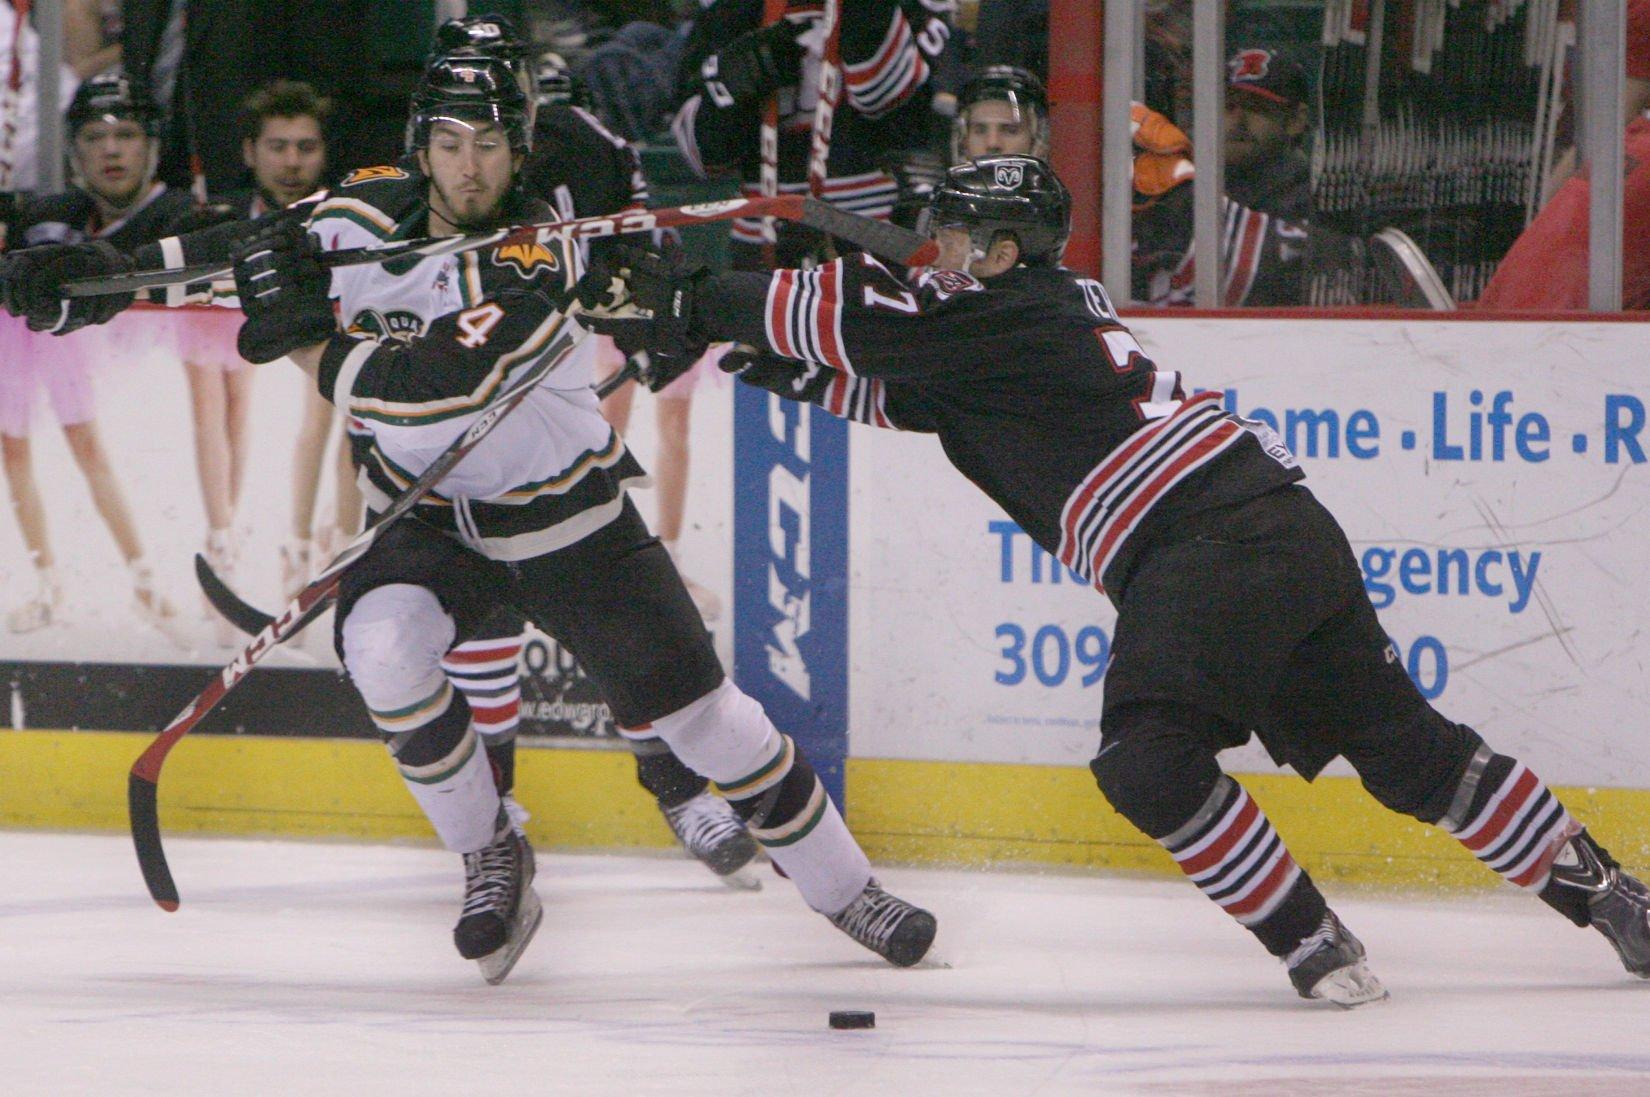 ECHL: Mallards Refreshed Following Holidays